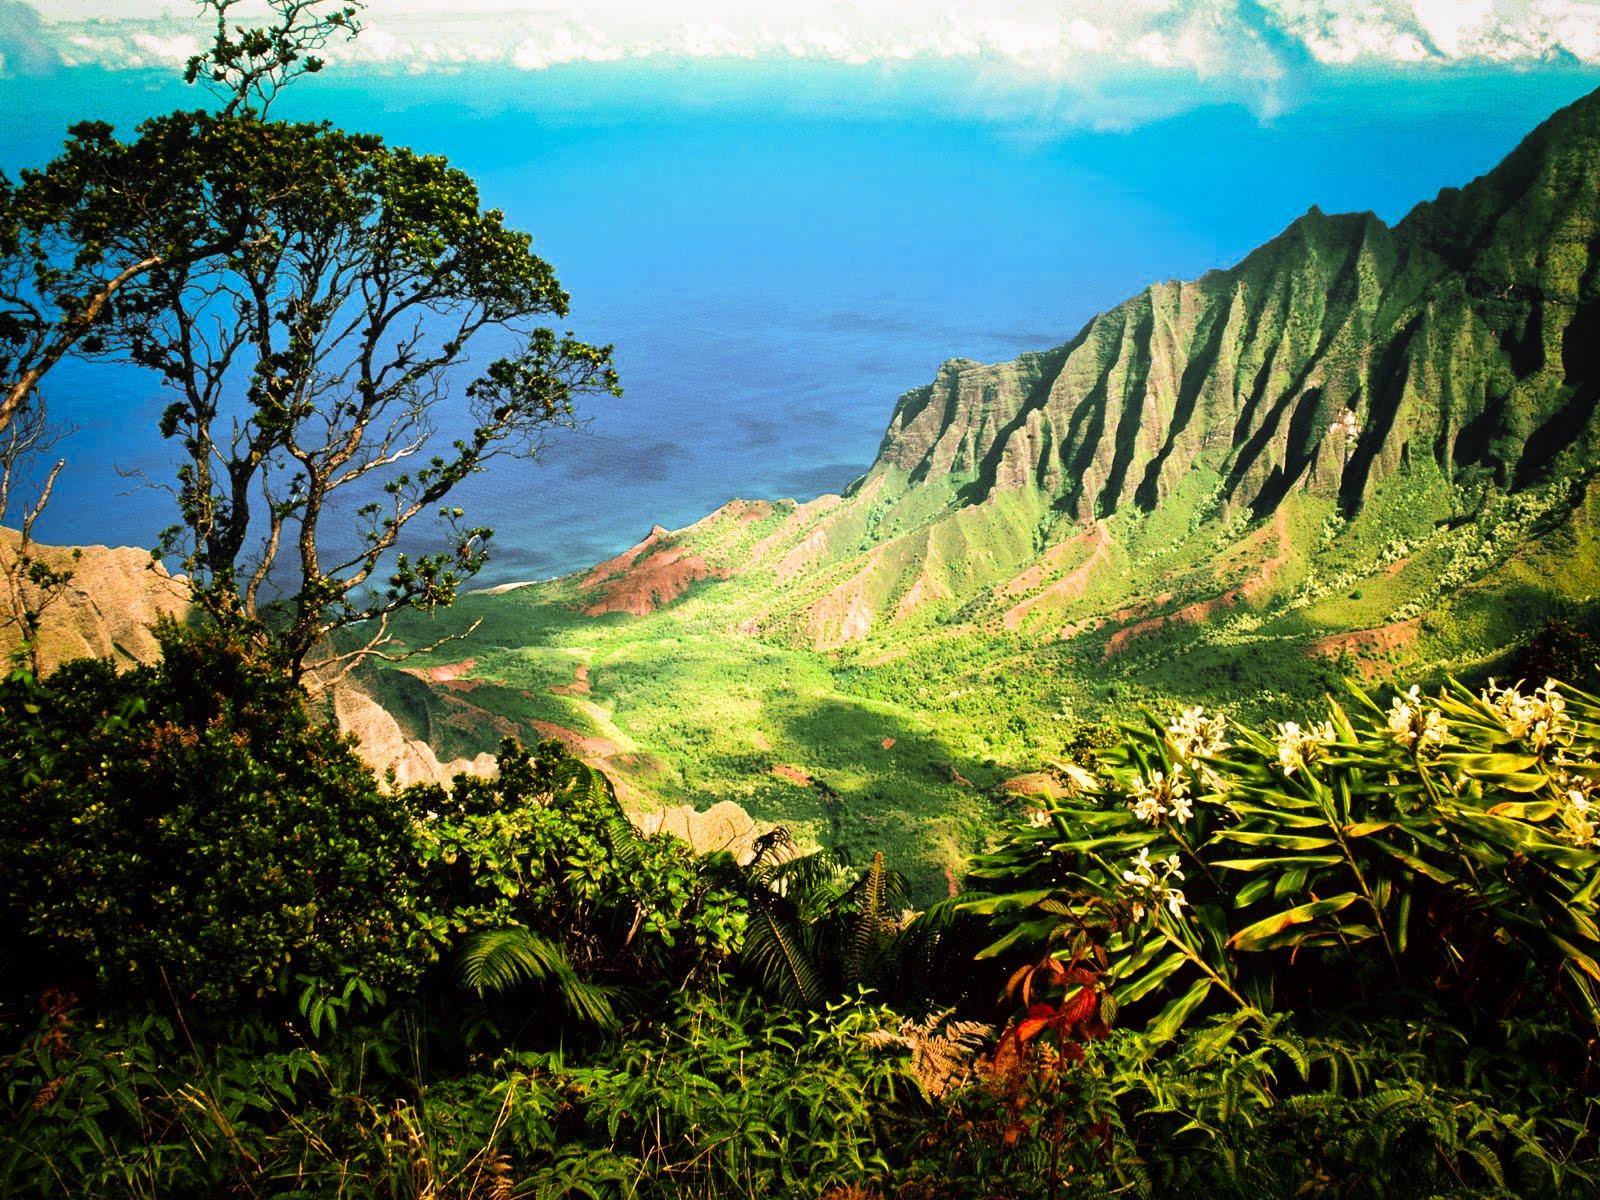 kauai hawaii wallpaper the desktop wallpaper